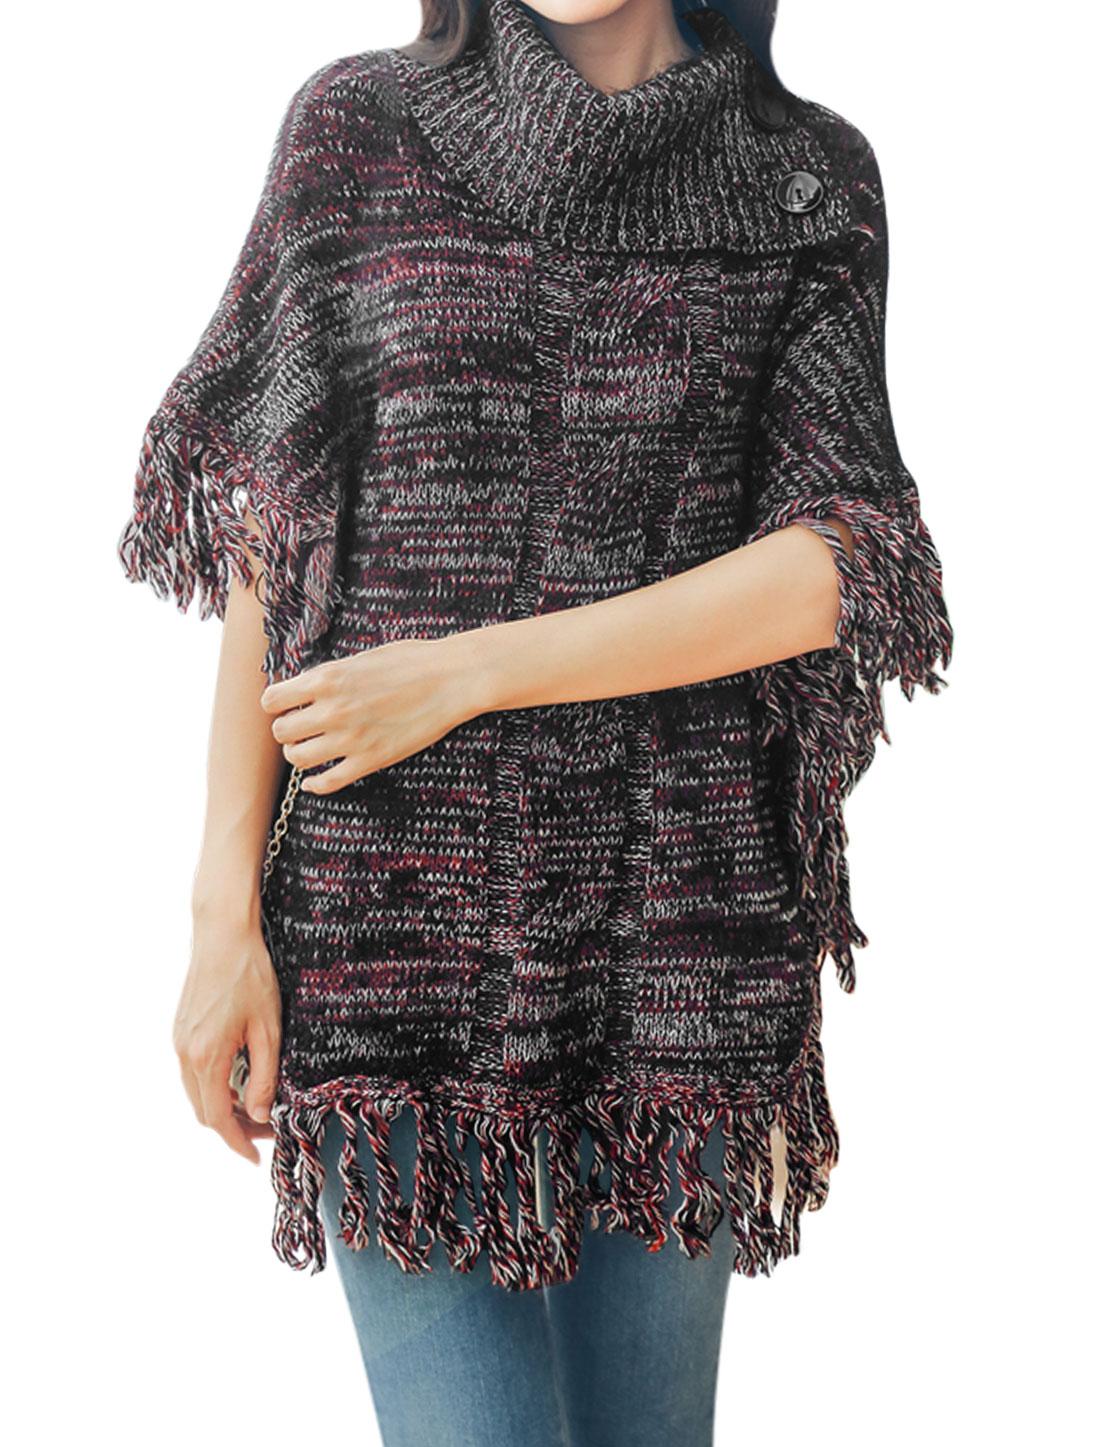 Women-Turtle-Neck-Batwing-Sleeves-Tassels-Sweater-Poncho